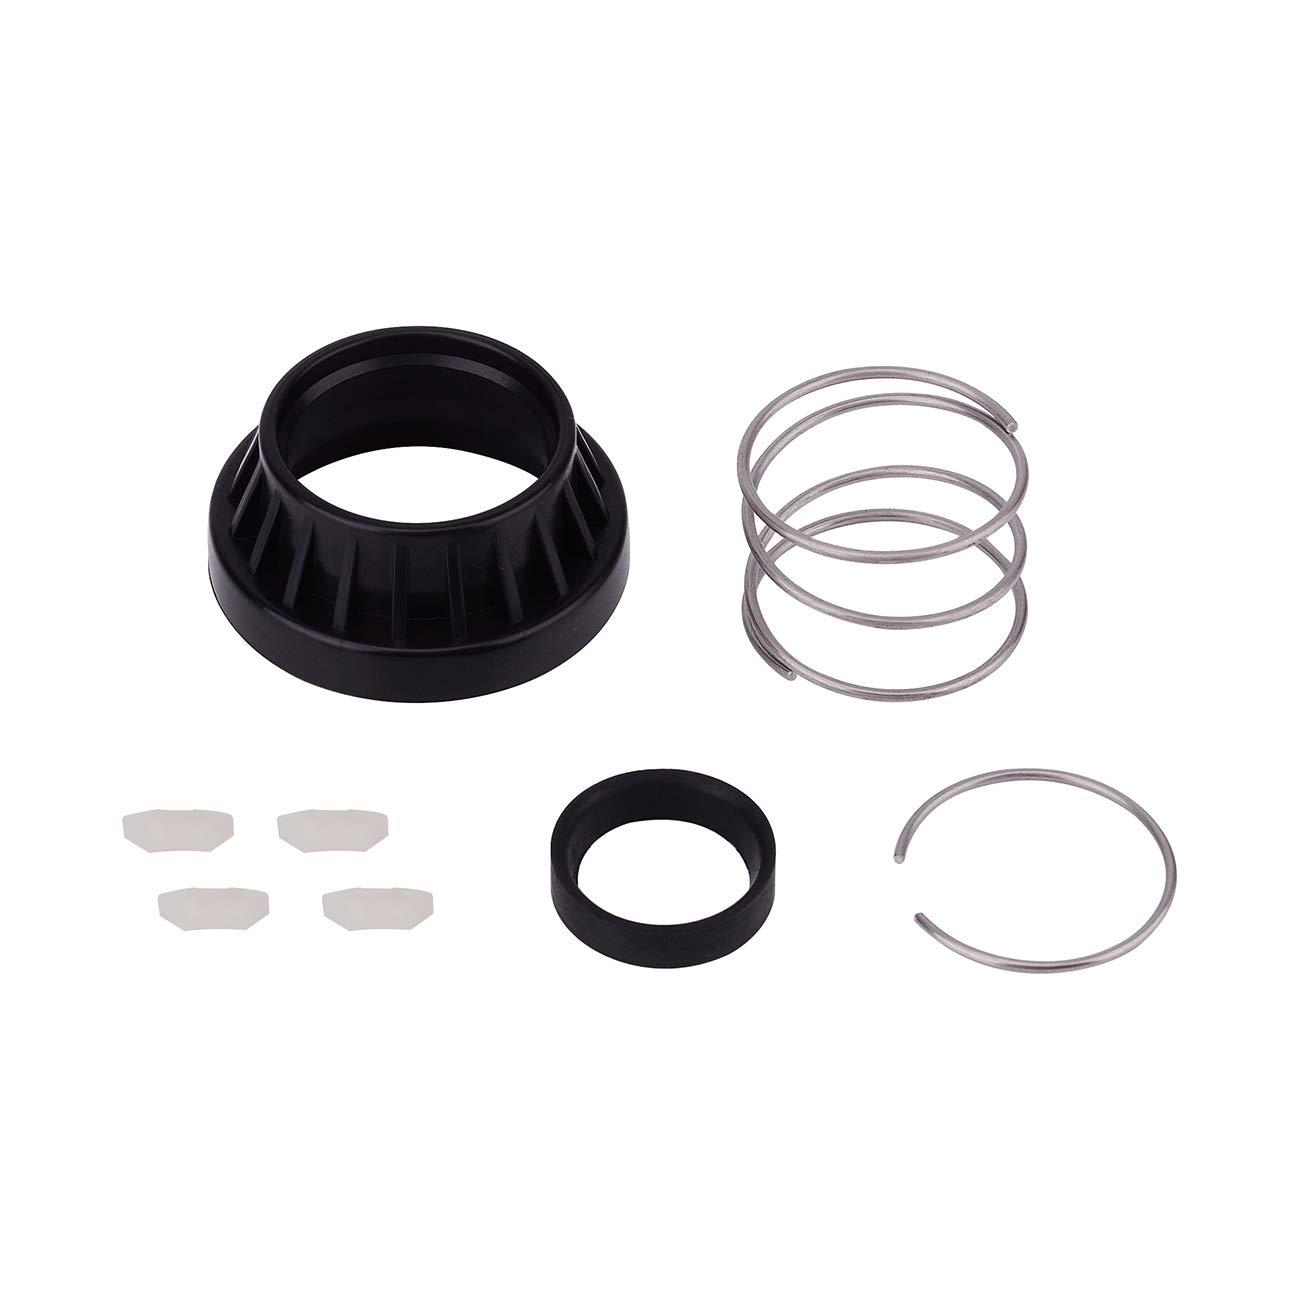 285170 Dishwasher Faucet Coupler Kit for WP285170 PS334438